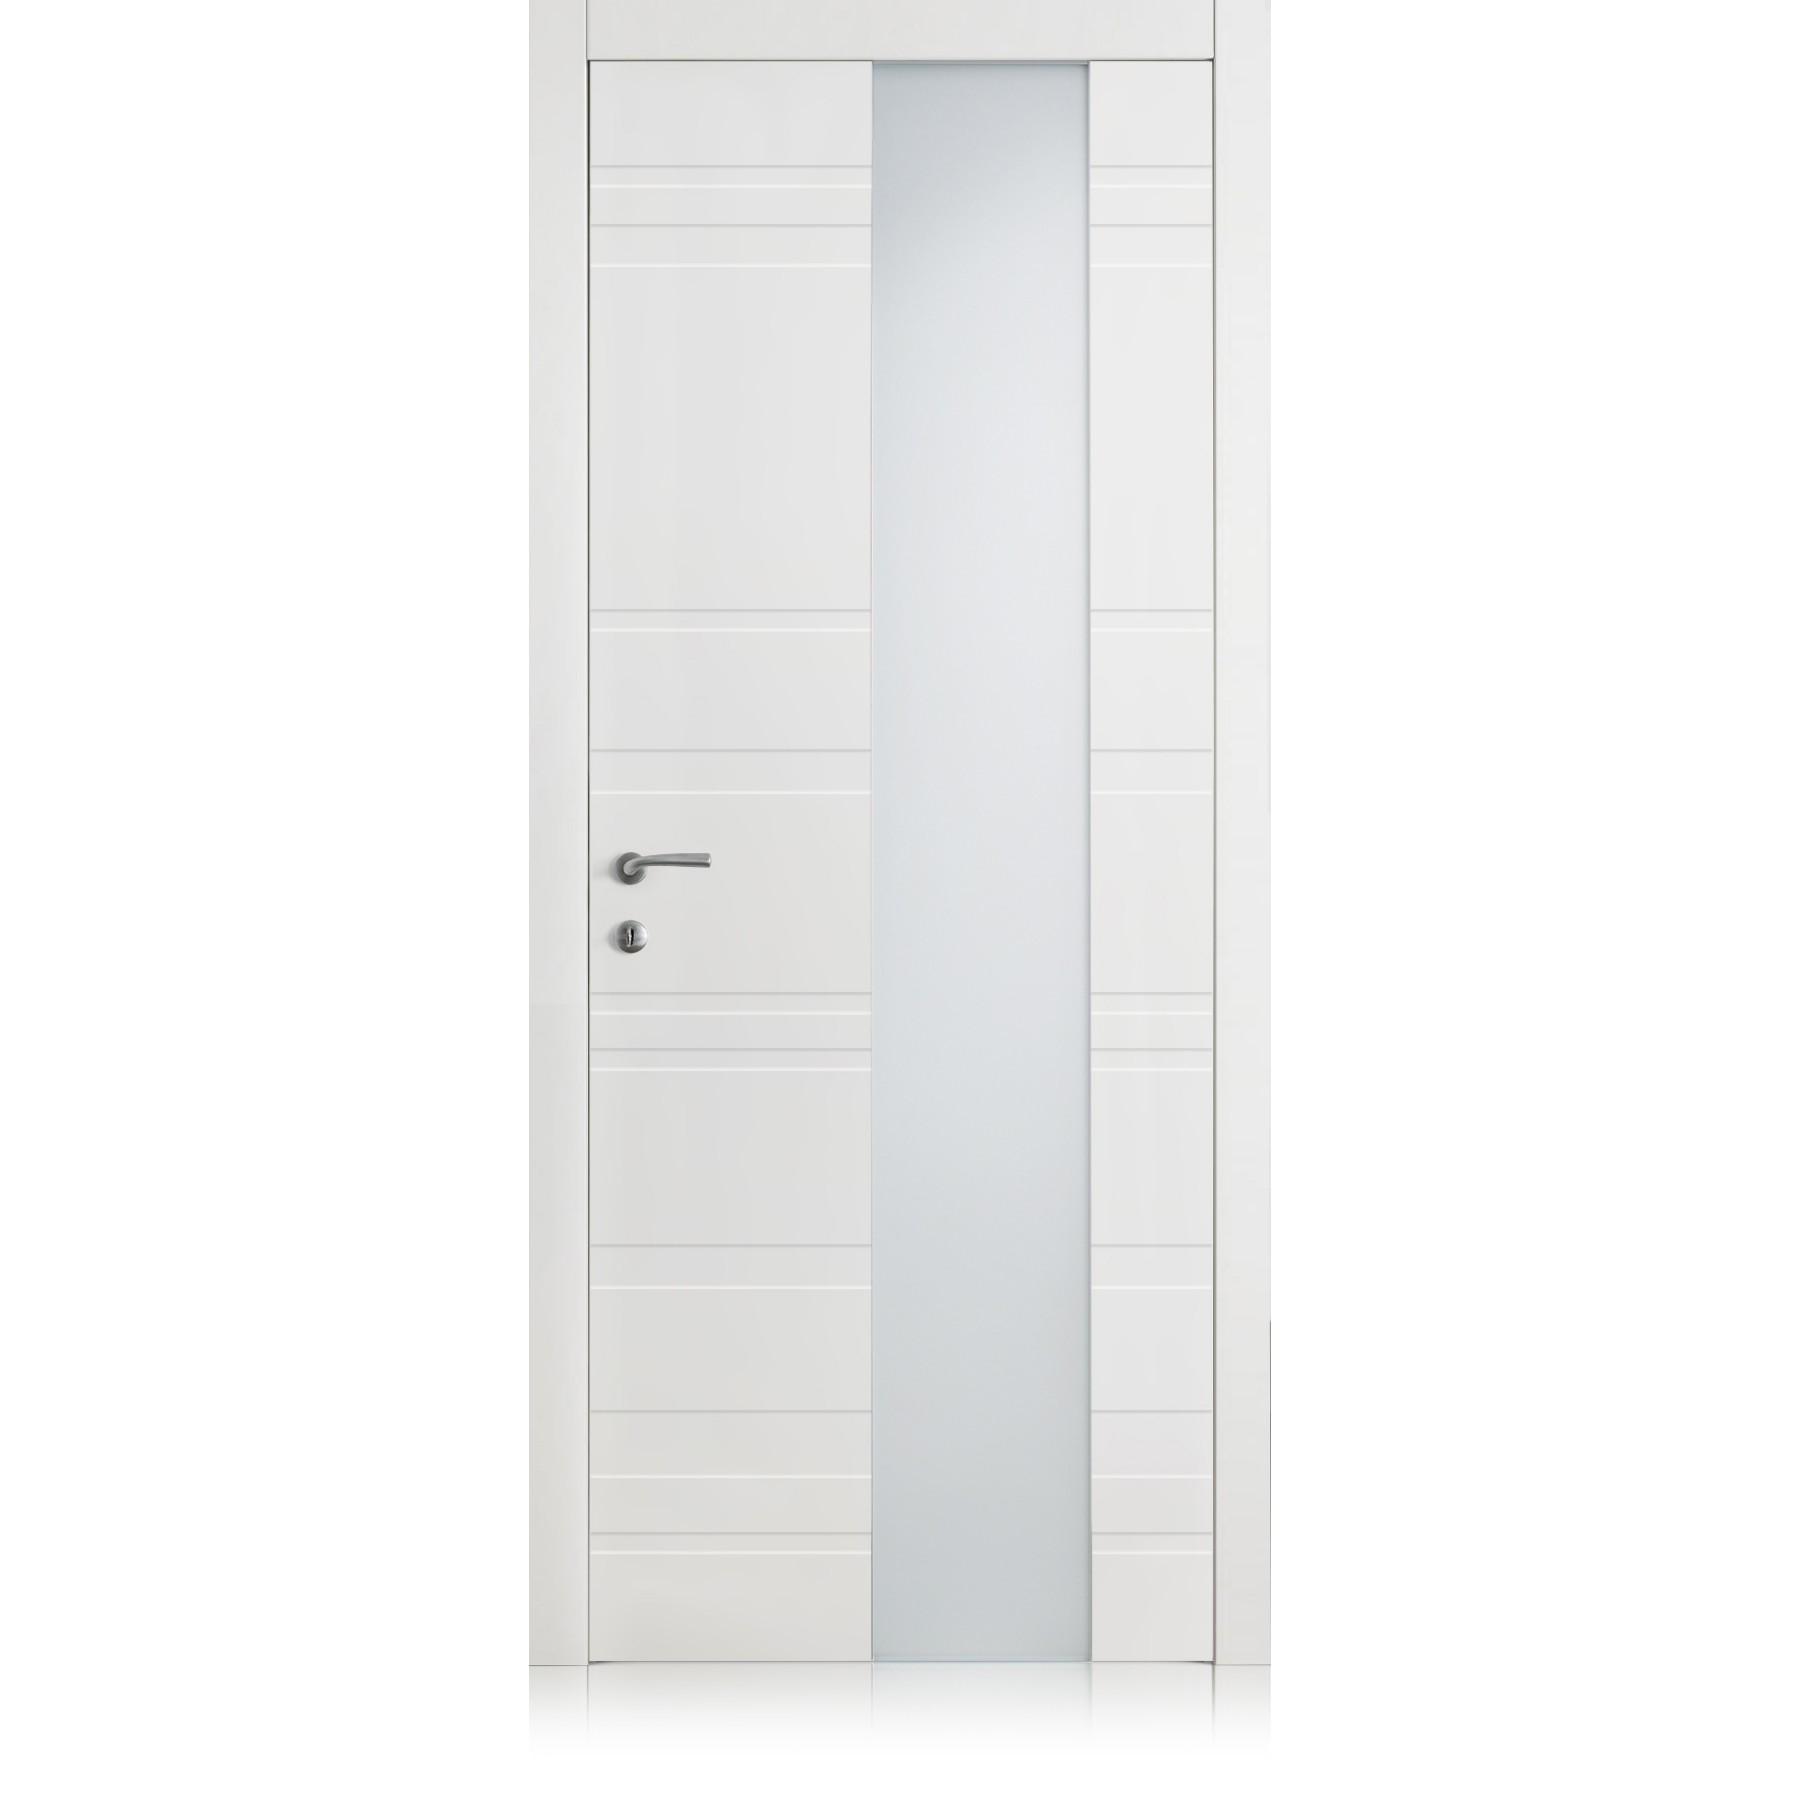 Yncisa Styla Vetro bianco door